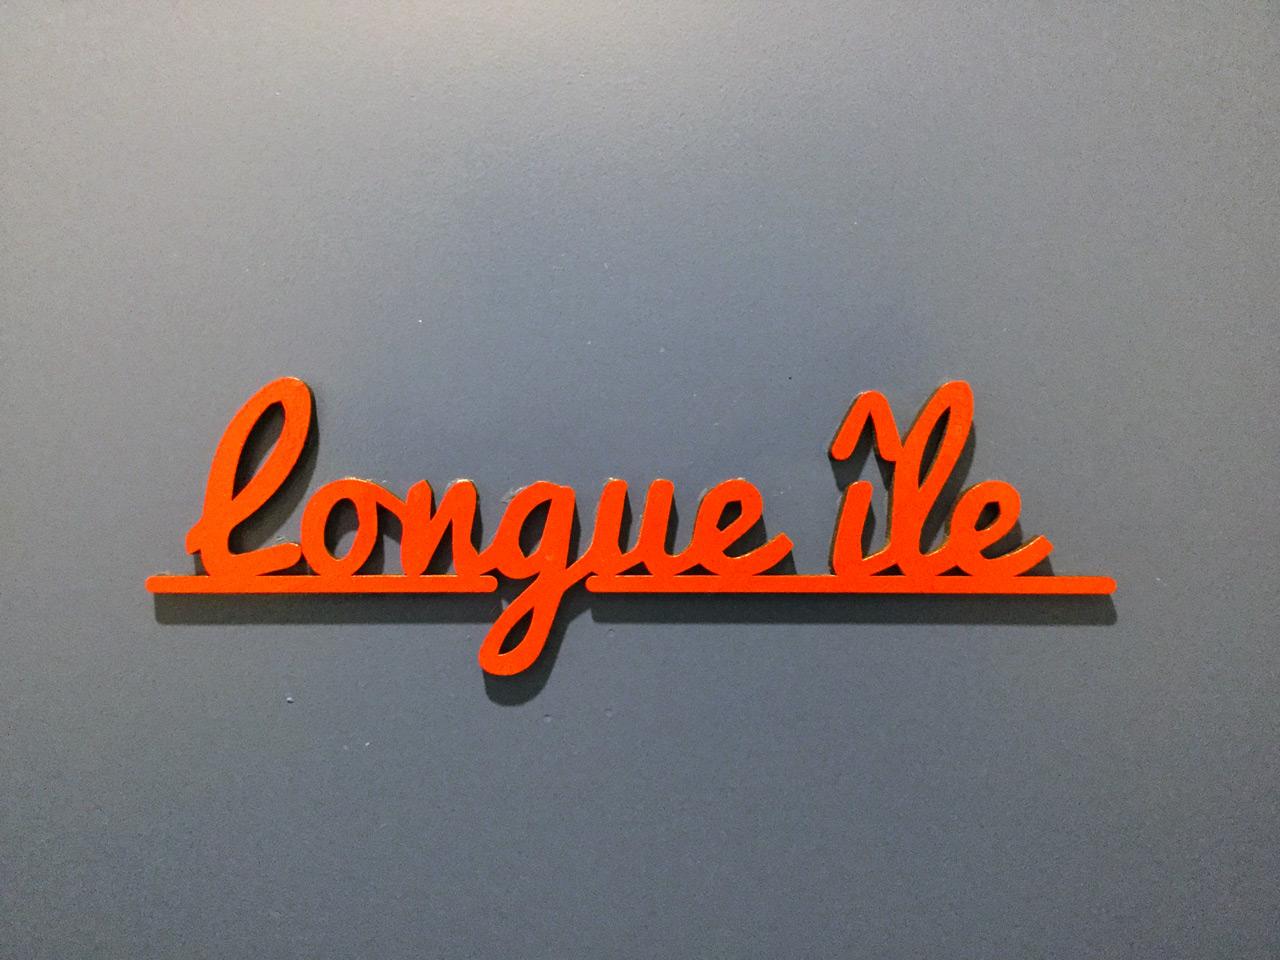 LongueIle_Enseigne